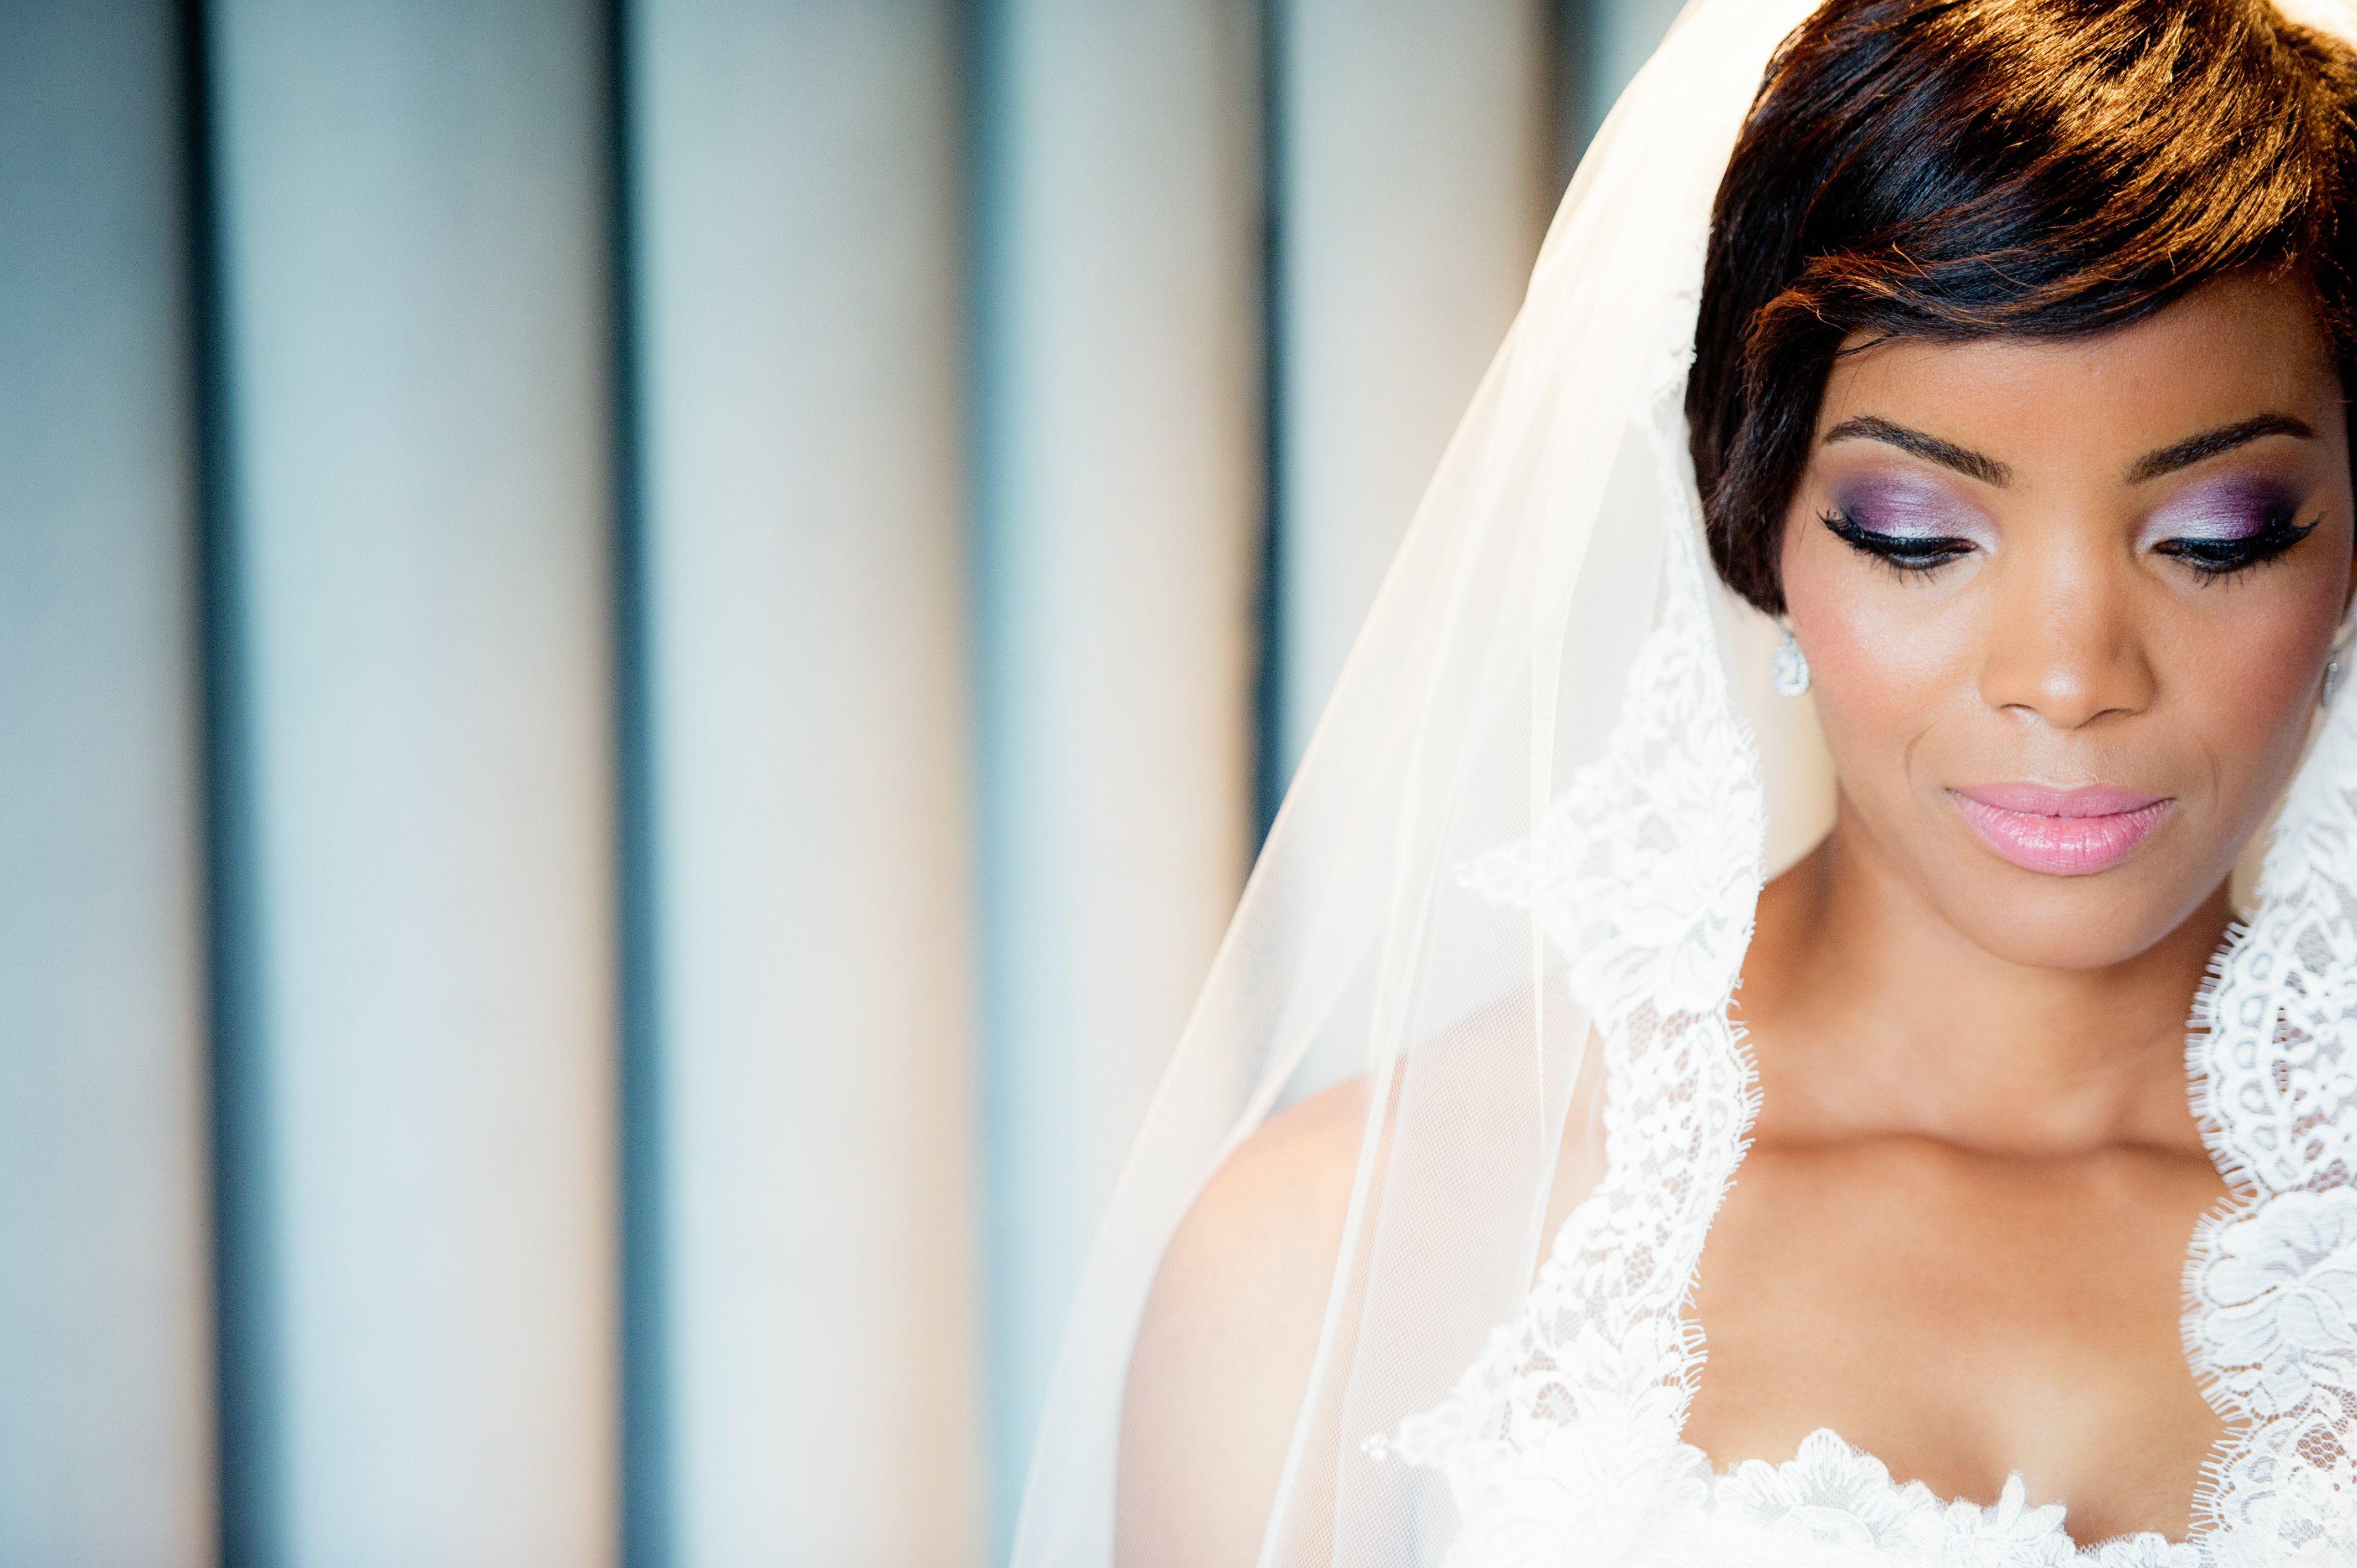 Elegant Bridal Makeup   Girl Shite   Pinterest   Bridal make up ...